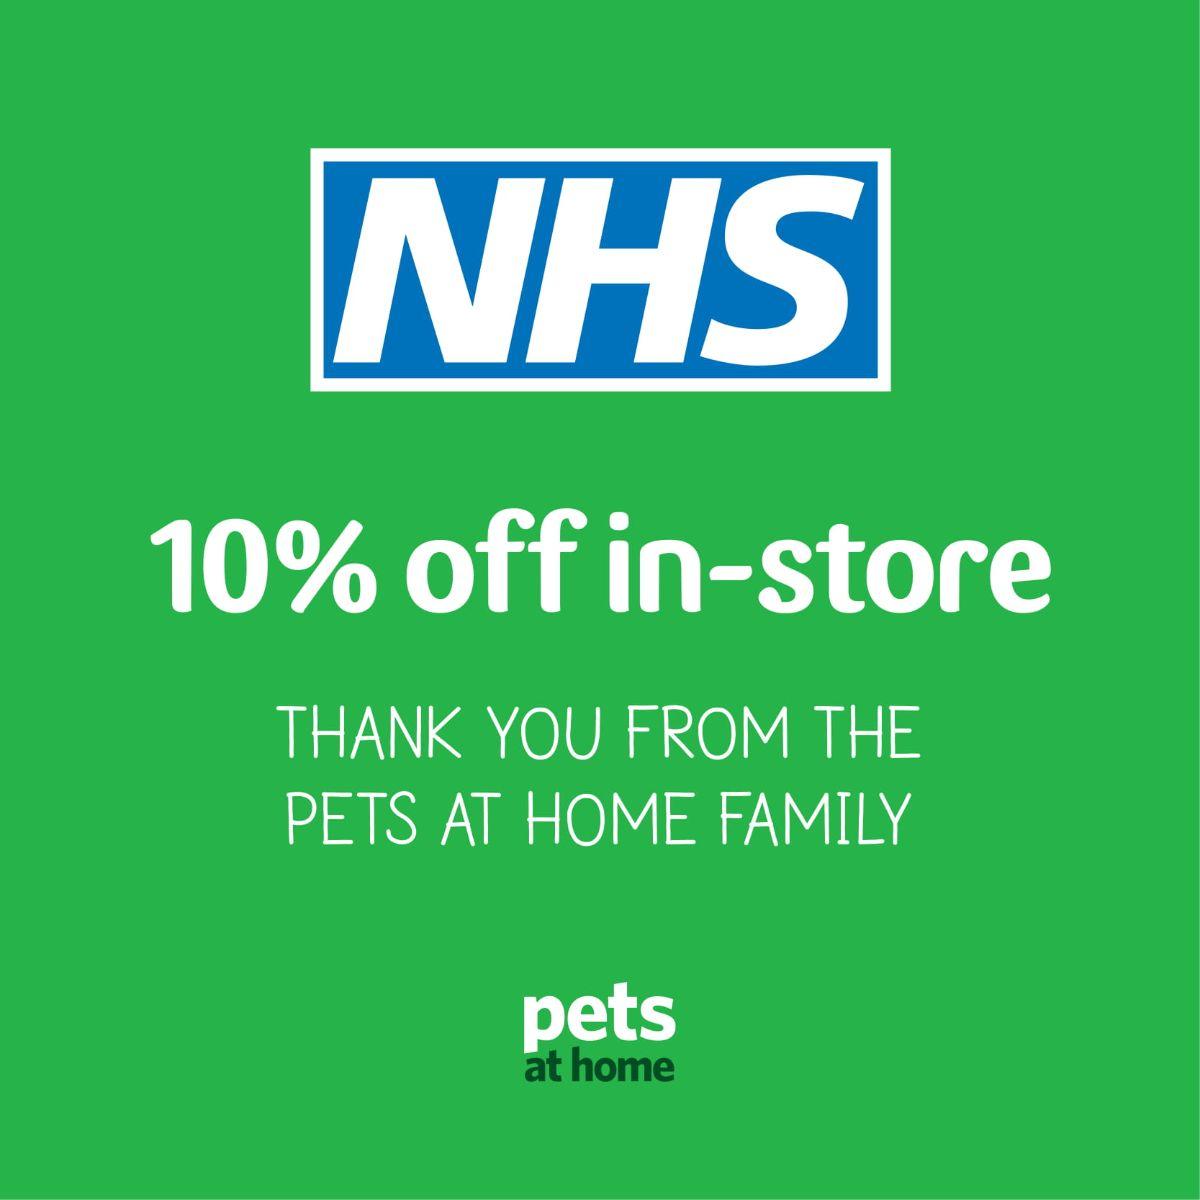 pets at home nhs discount